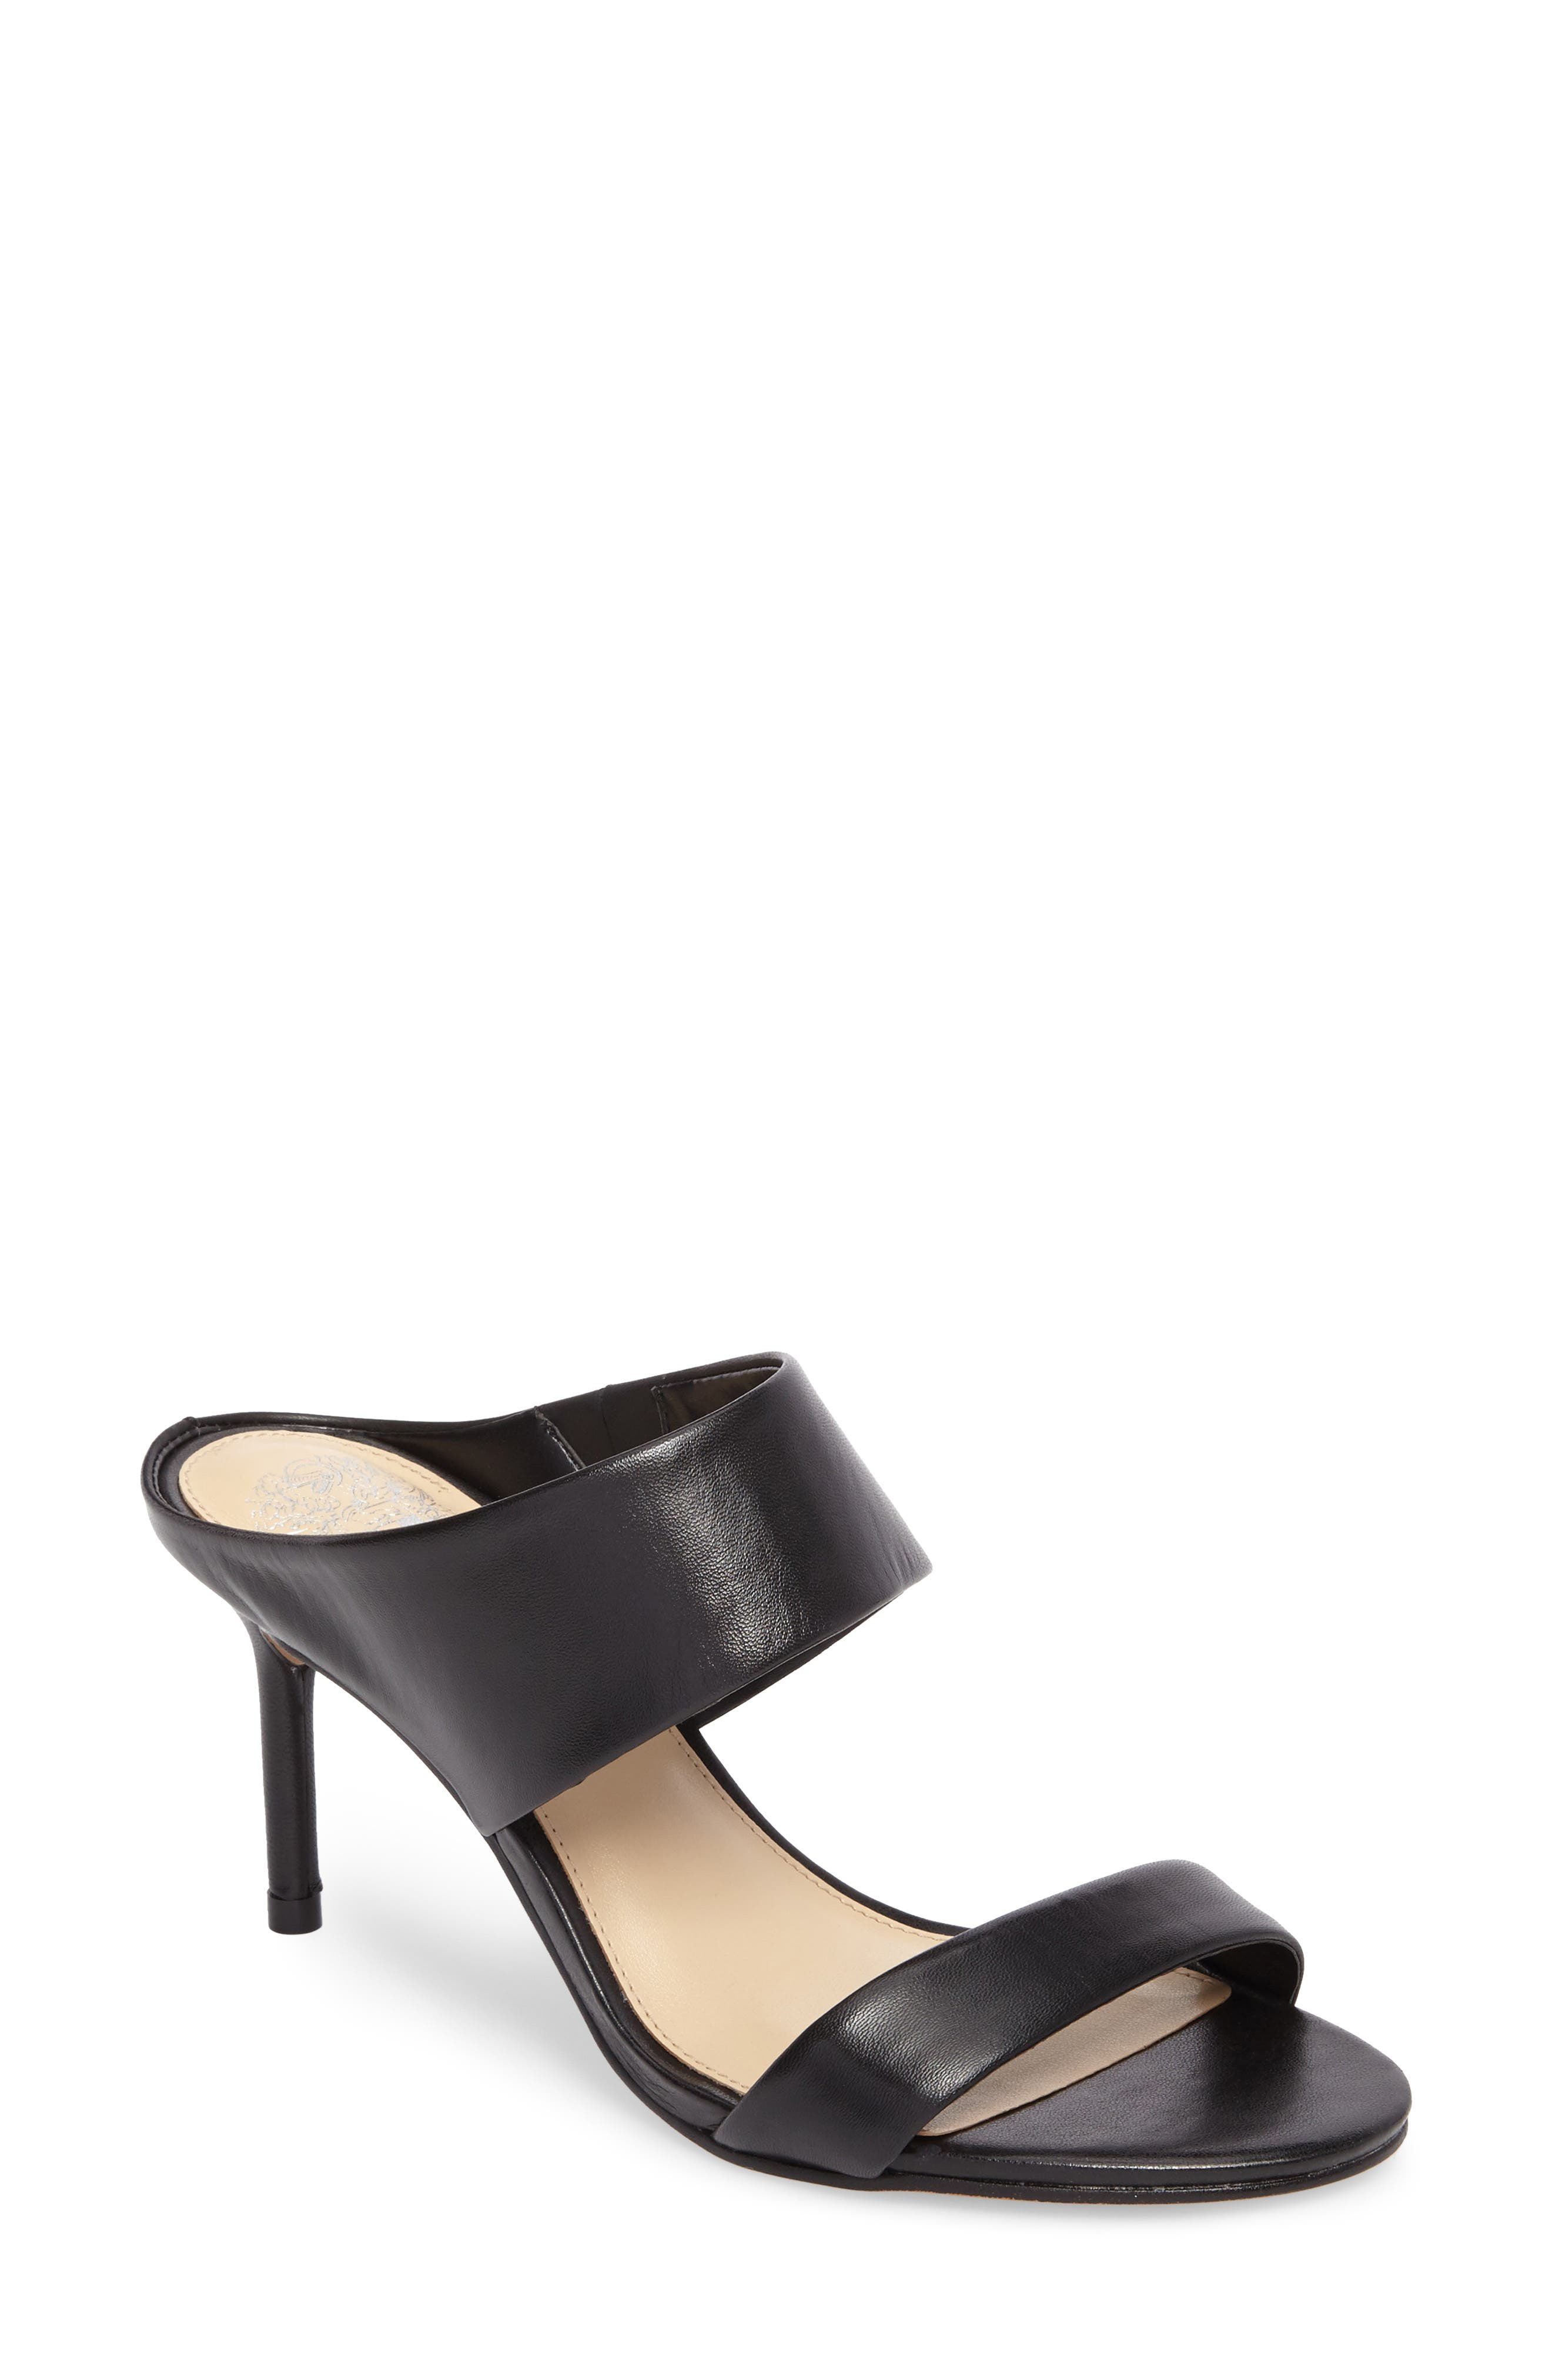 Navinta Sandal,                             Main thumbnail 1, color,                             Black Nappa Leather